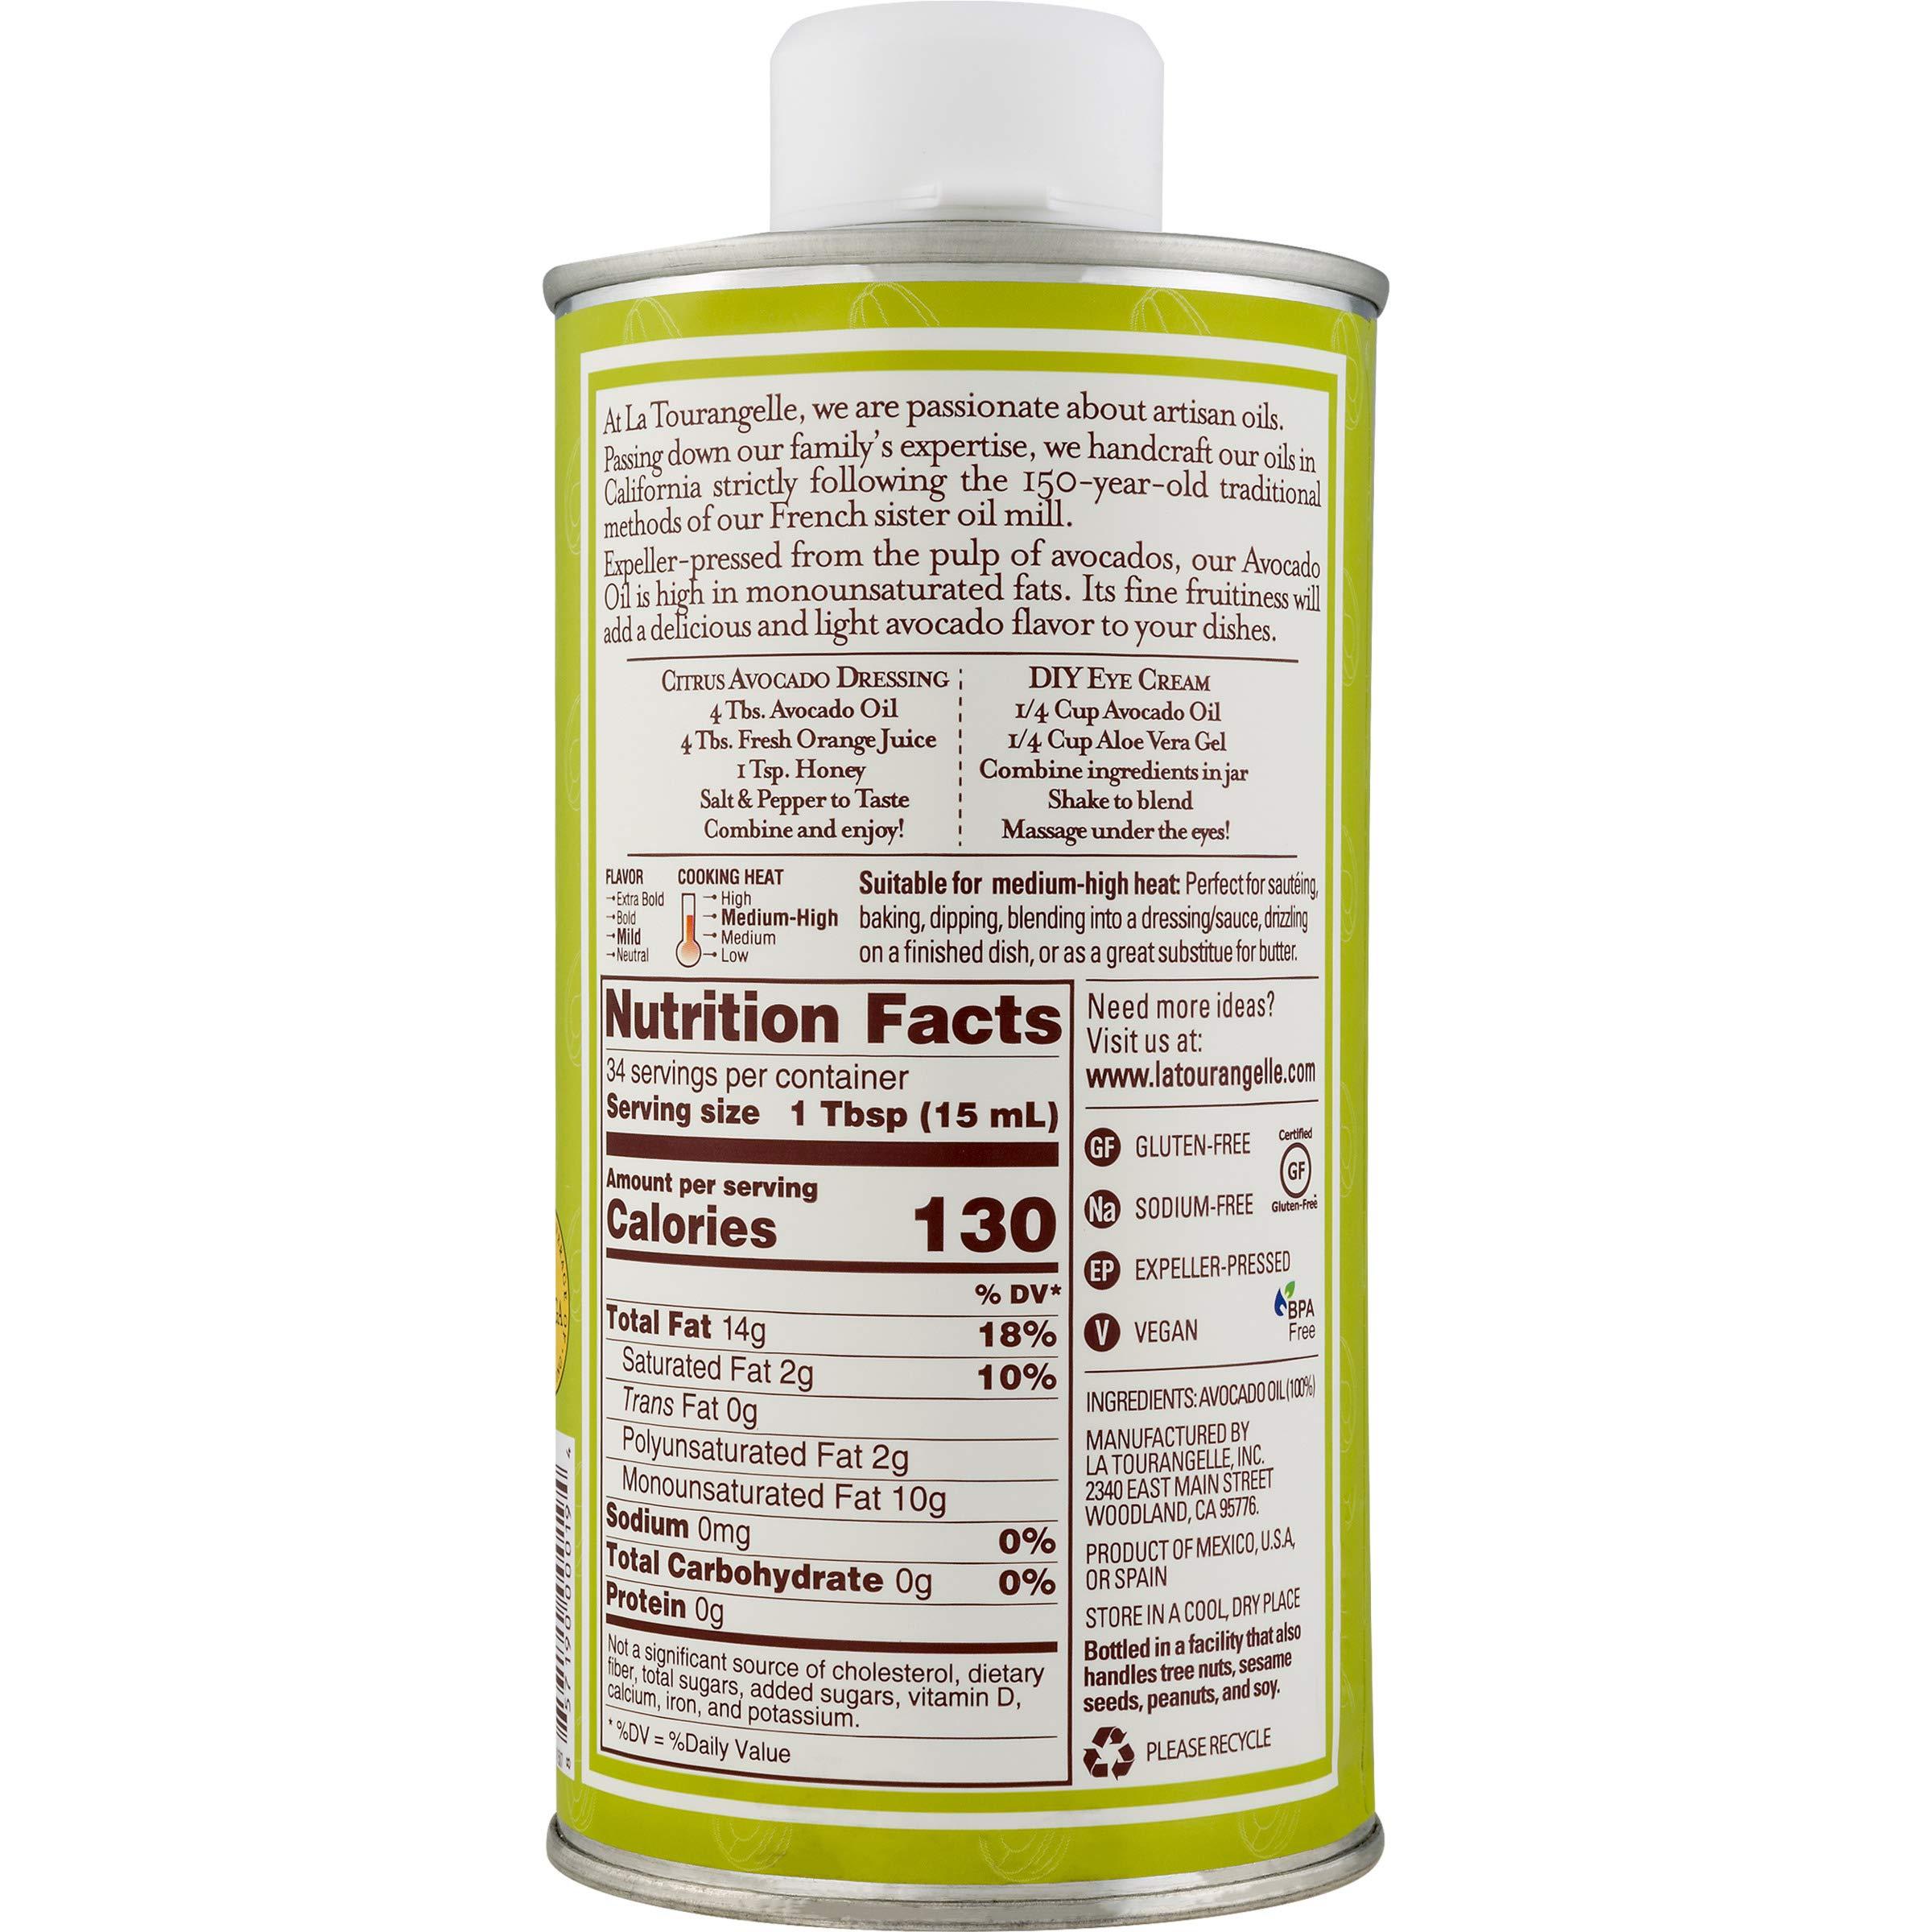 La Tourangelle Avocado Oil 16.9 Fl. Oz., All-Natural, Artisanal, Great for Salads, Fruit, Fish or Vegetables, Buttery Flavor by La Tourangelle (Image #4)